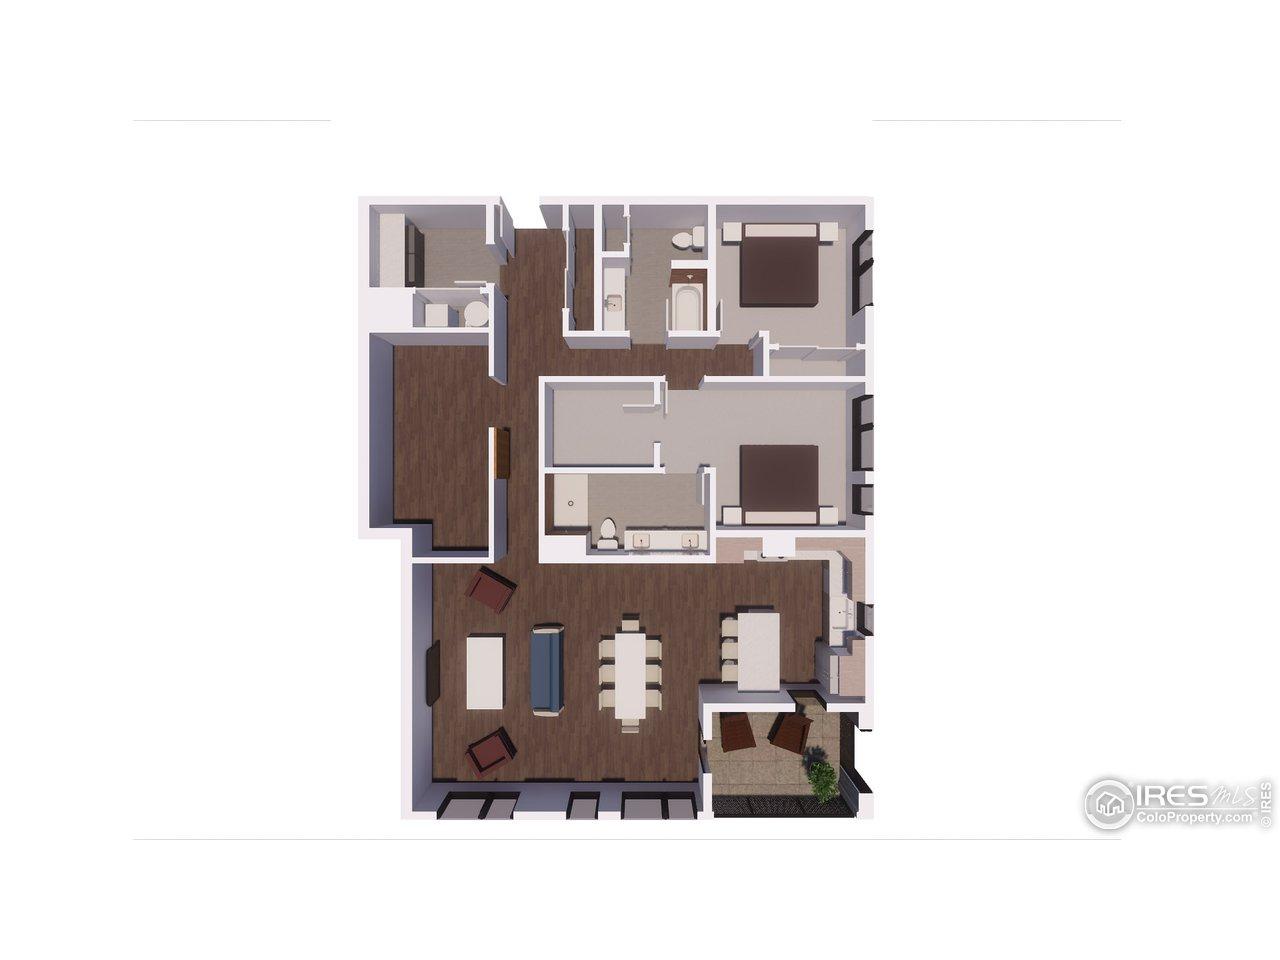 Unit 306 Floorplan